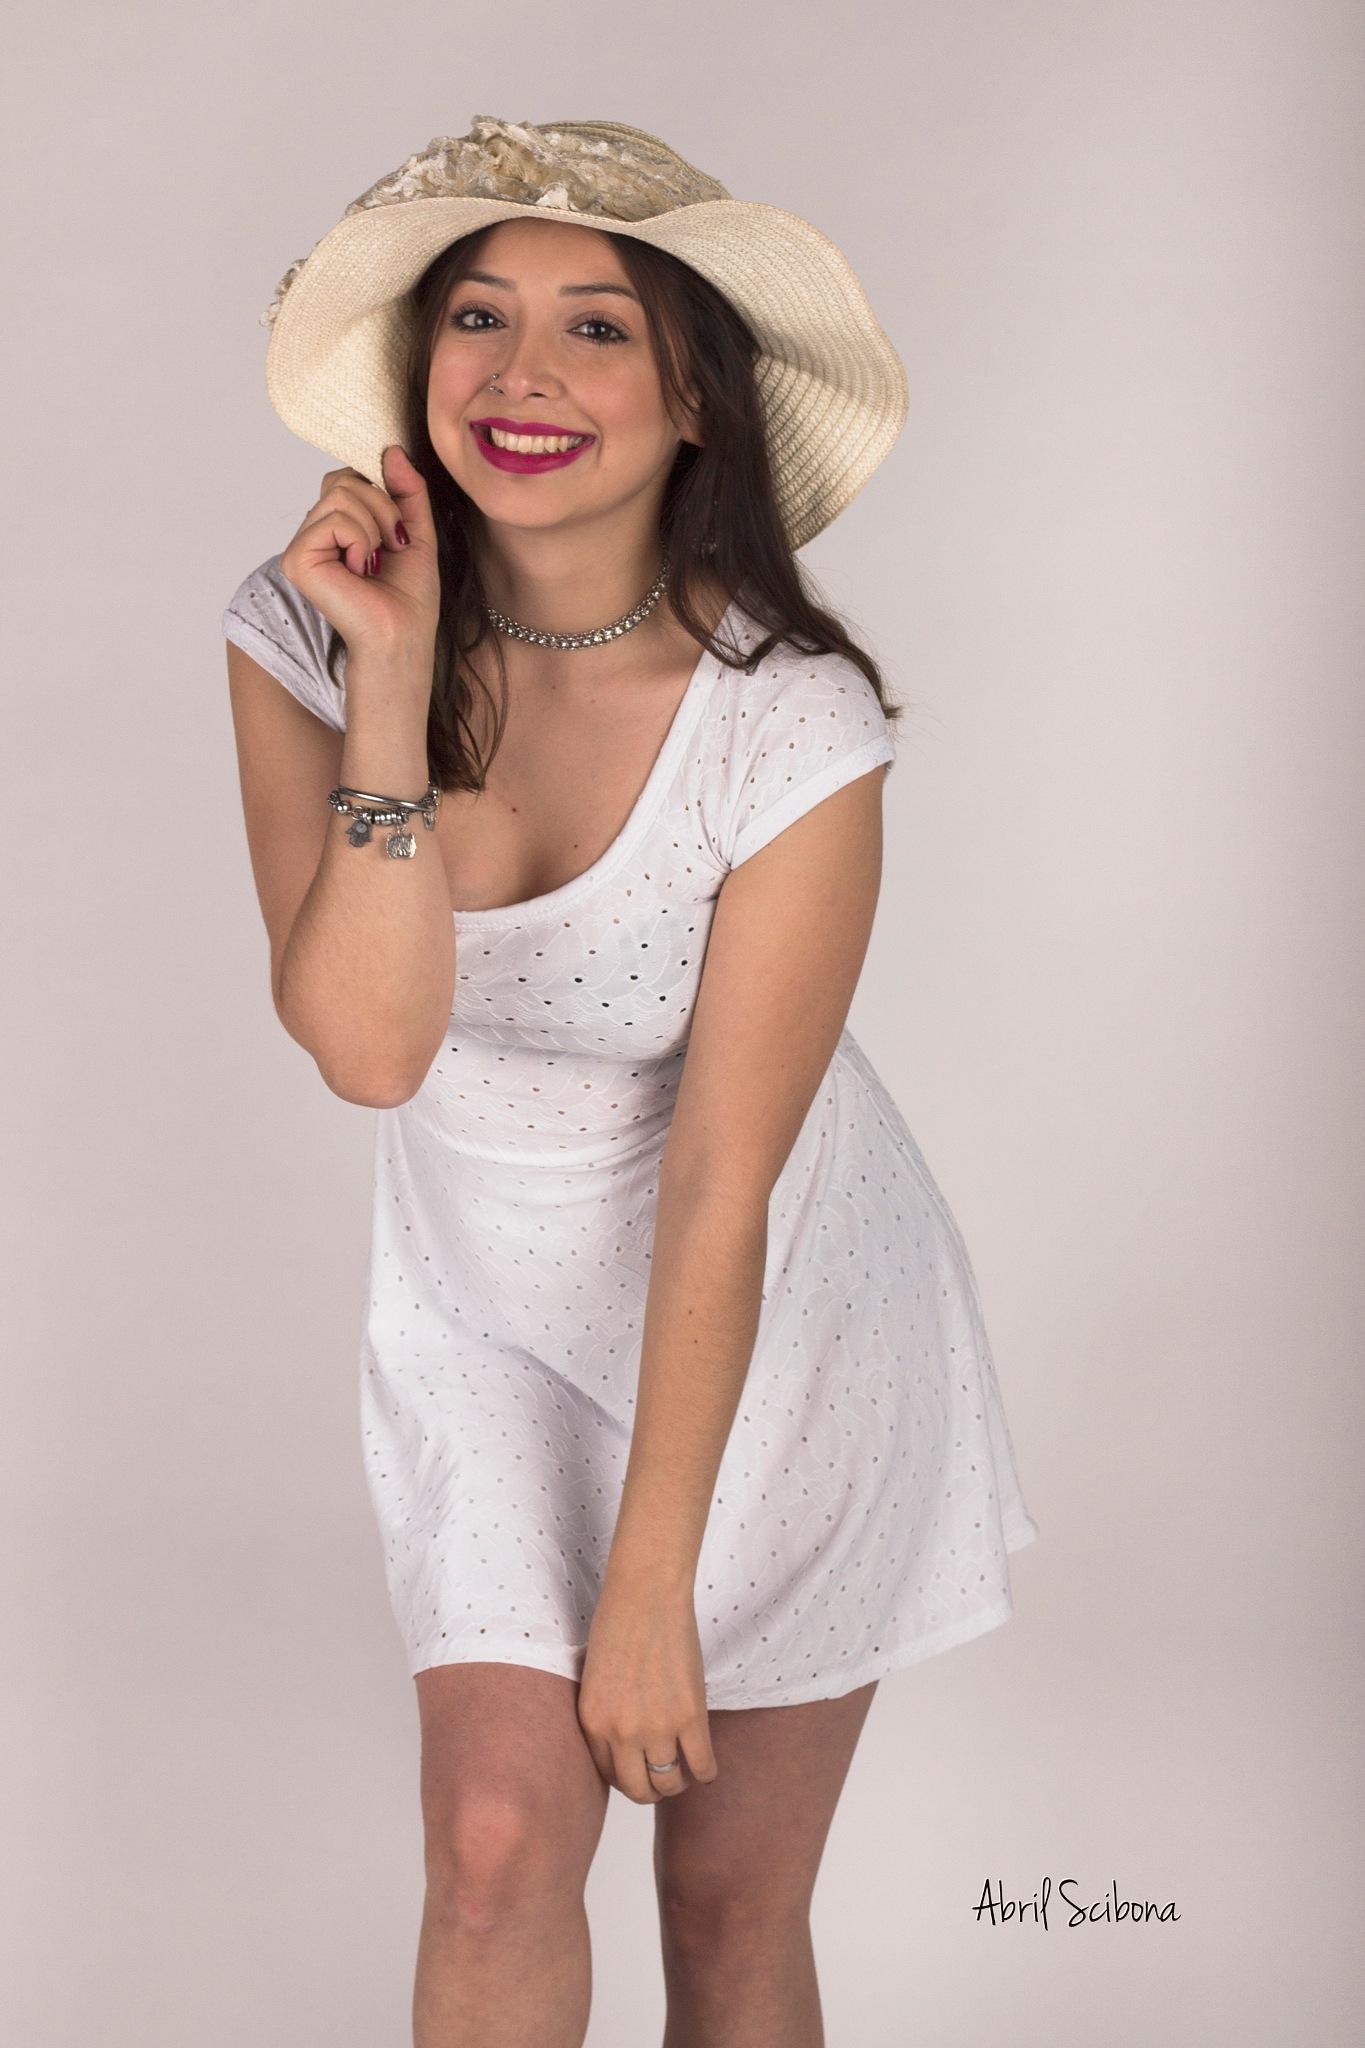 Summer mood by Abril Scibona